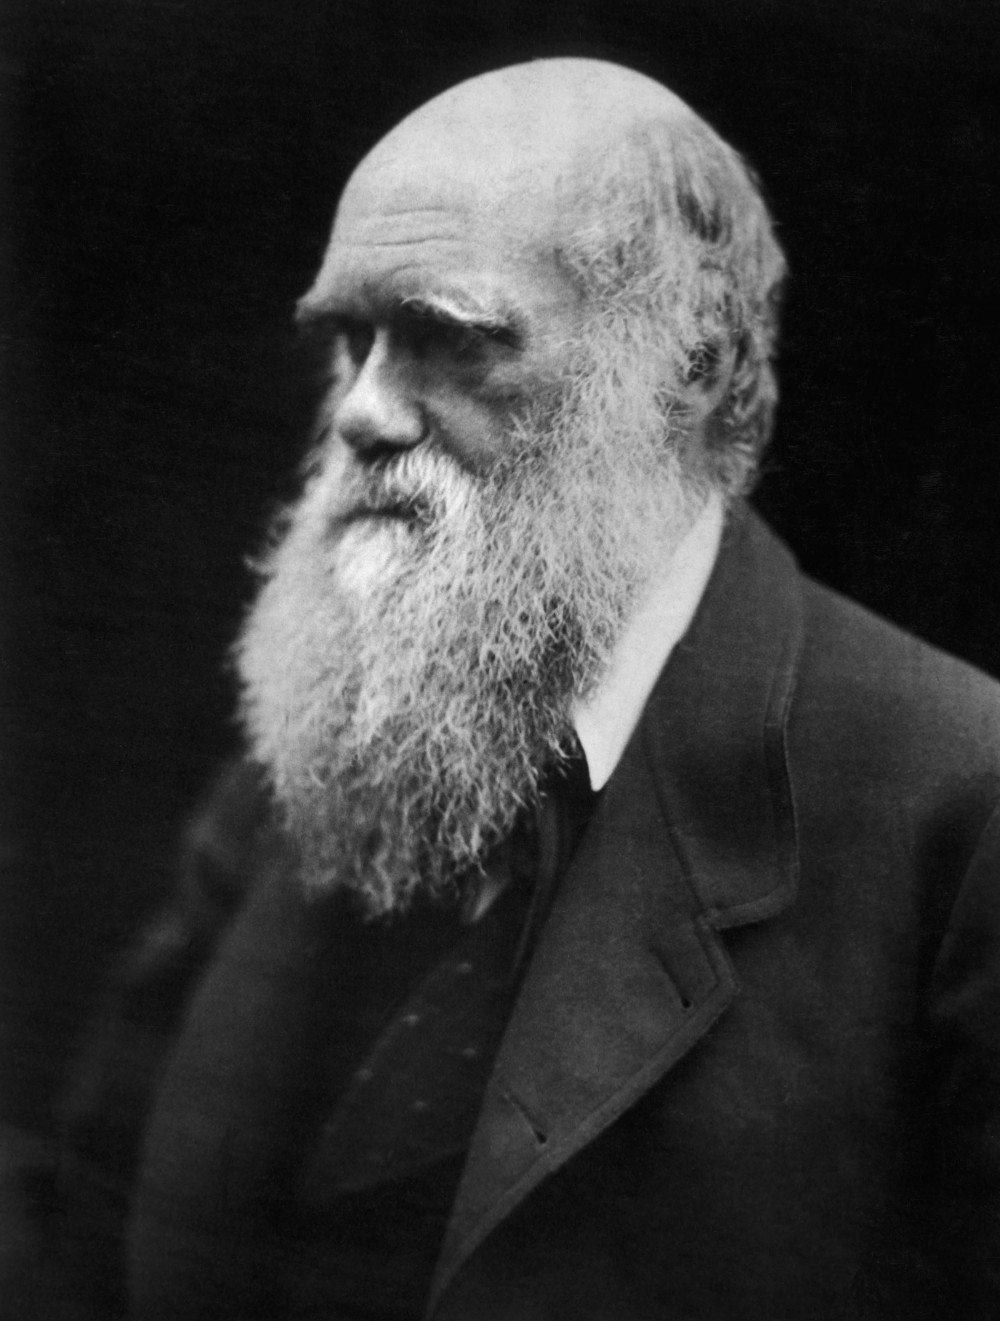 Charles_Darwin_photograph_by_Julia_Margaret_Cameron,_1968